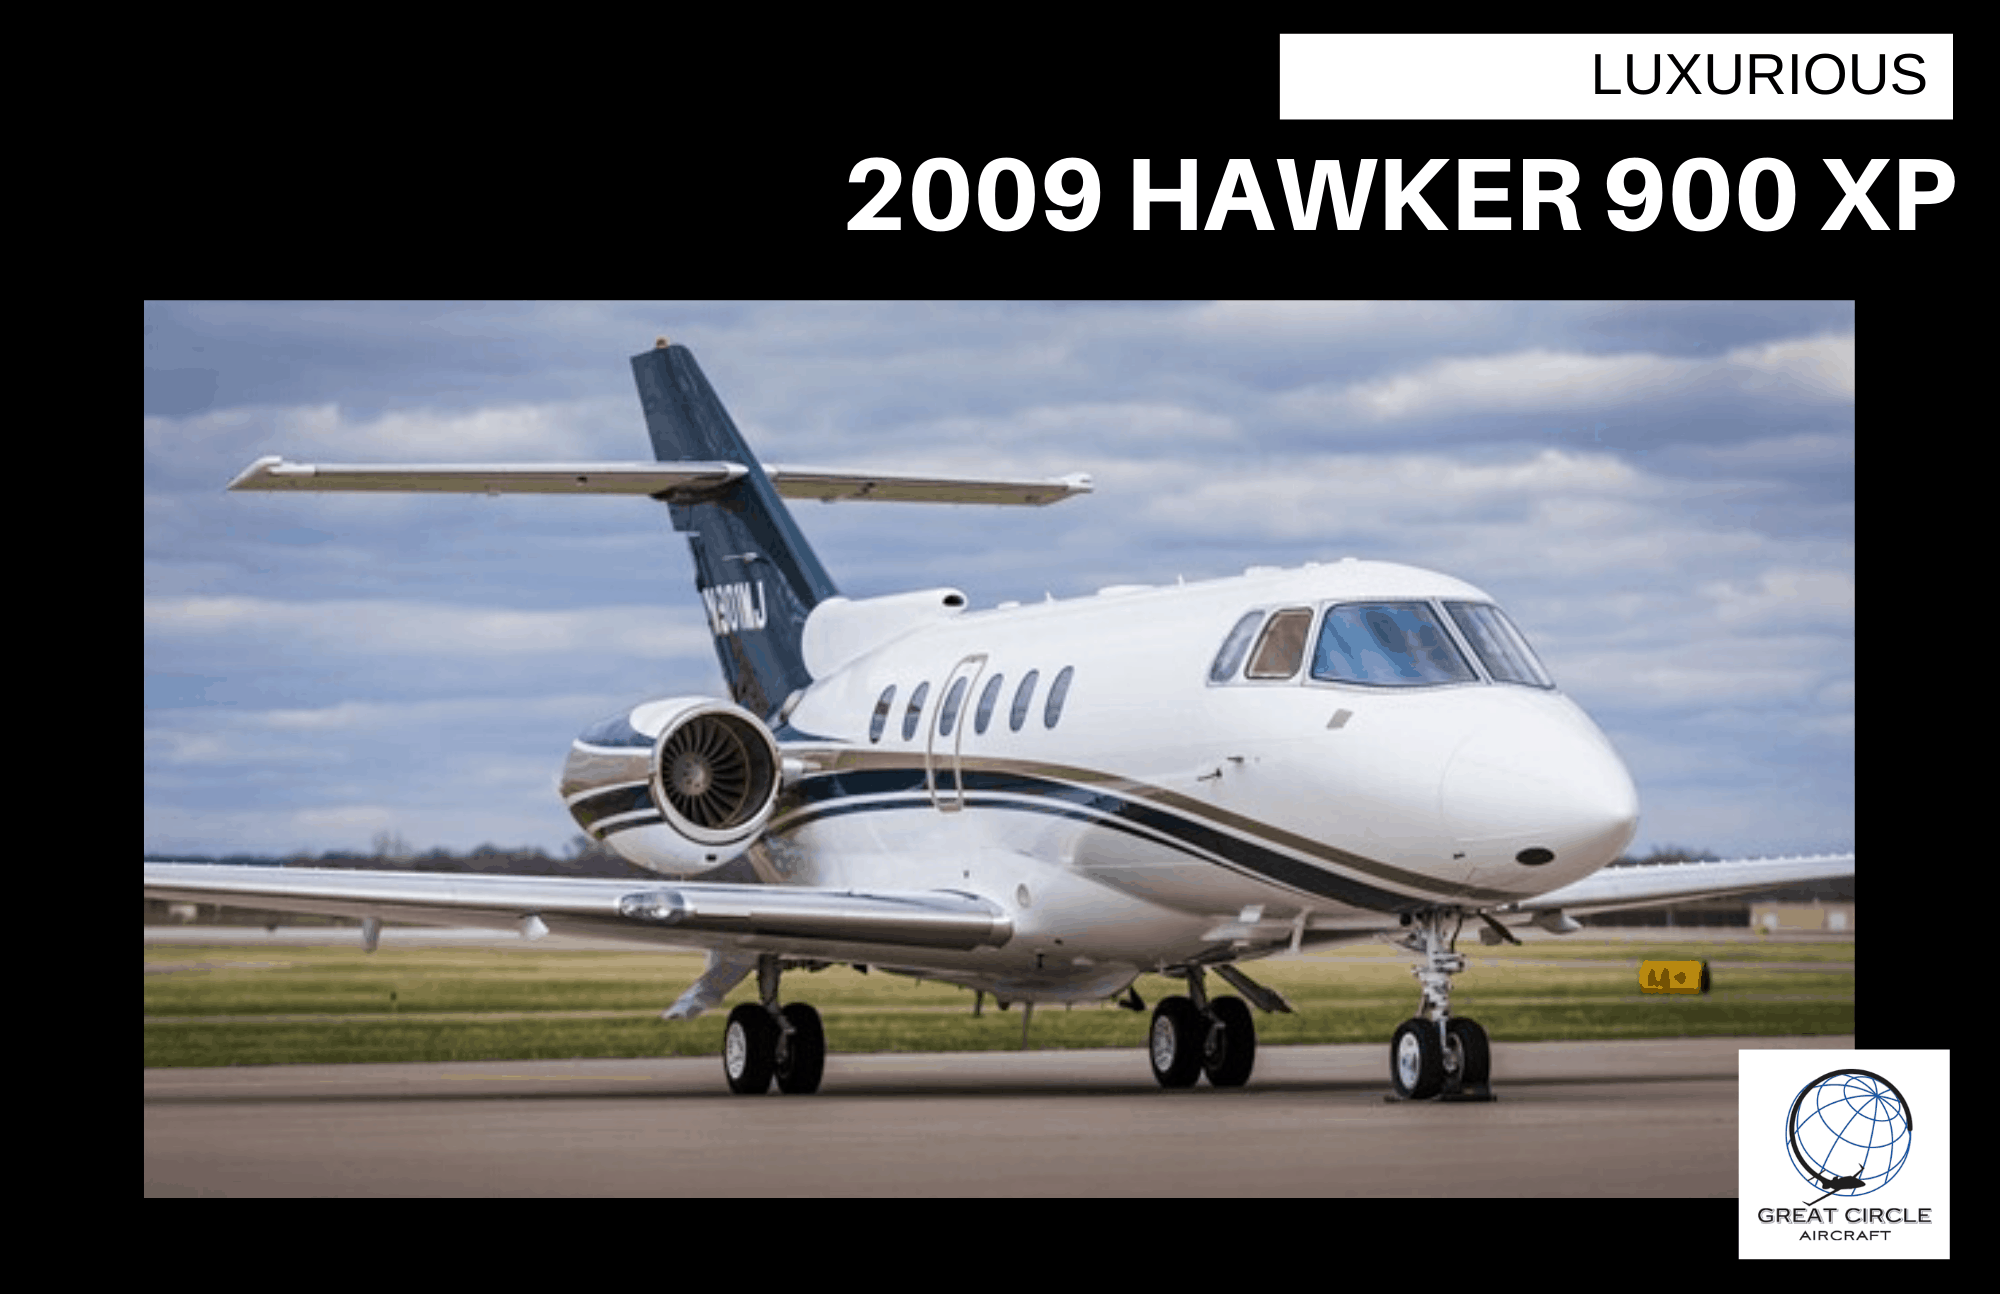 2008 Hawker 900 XP